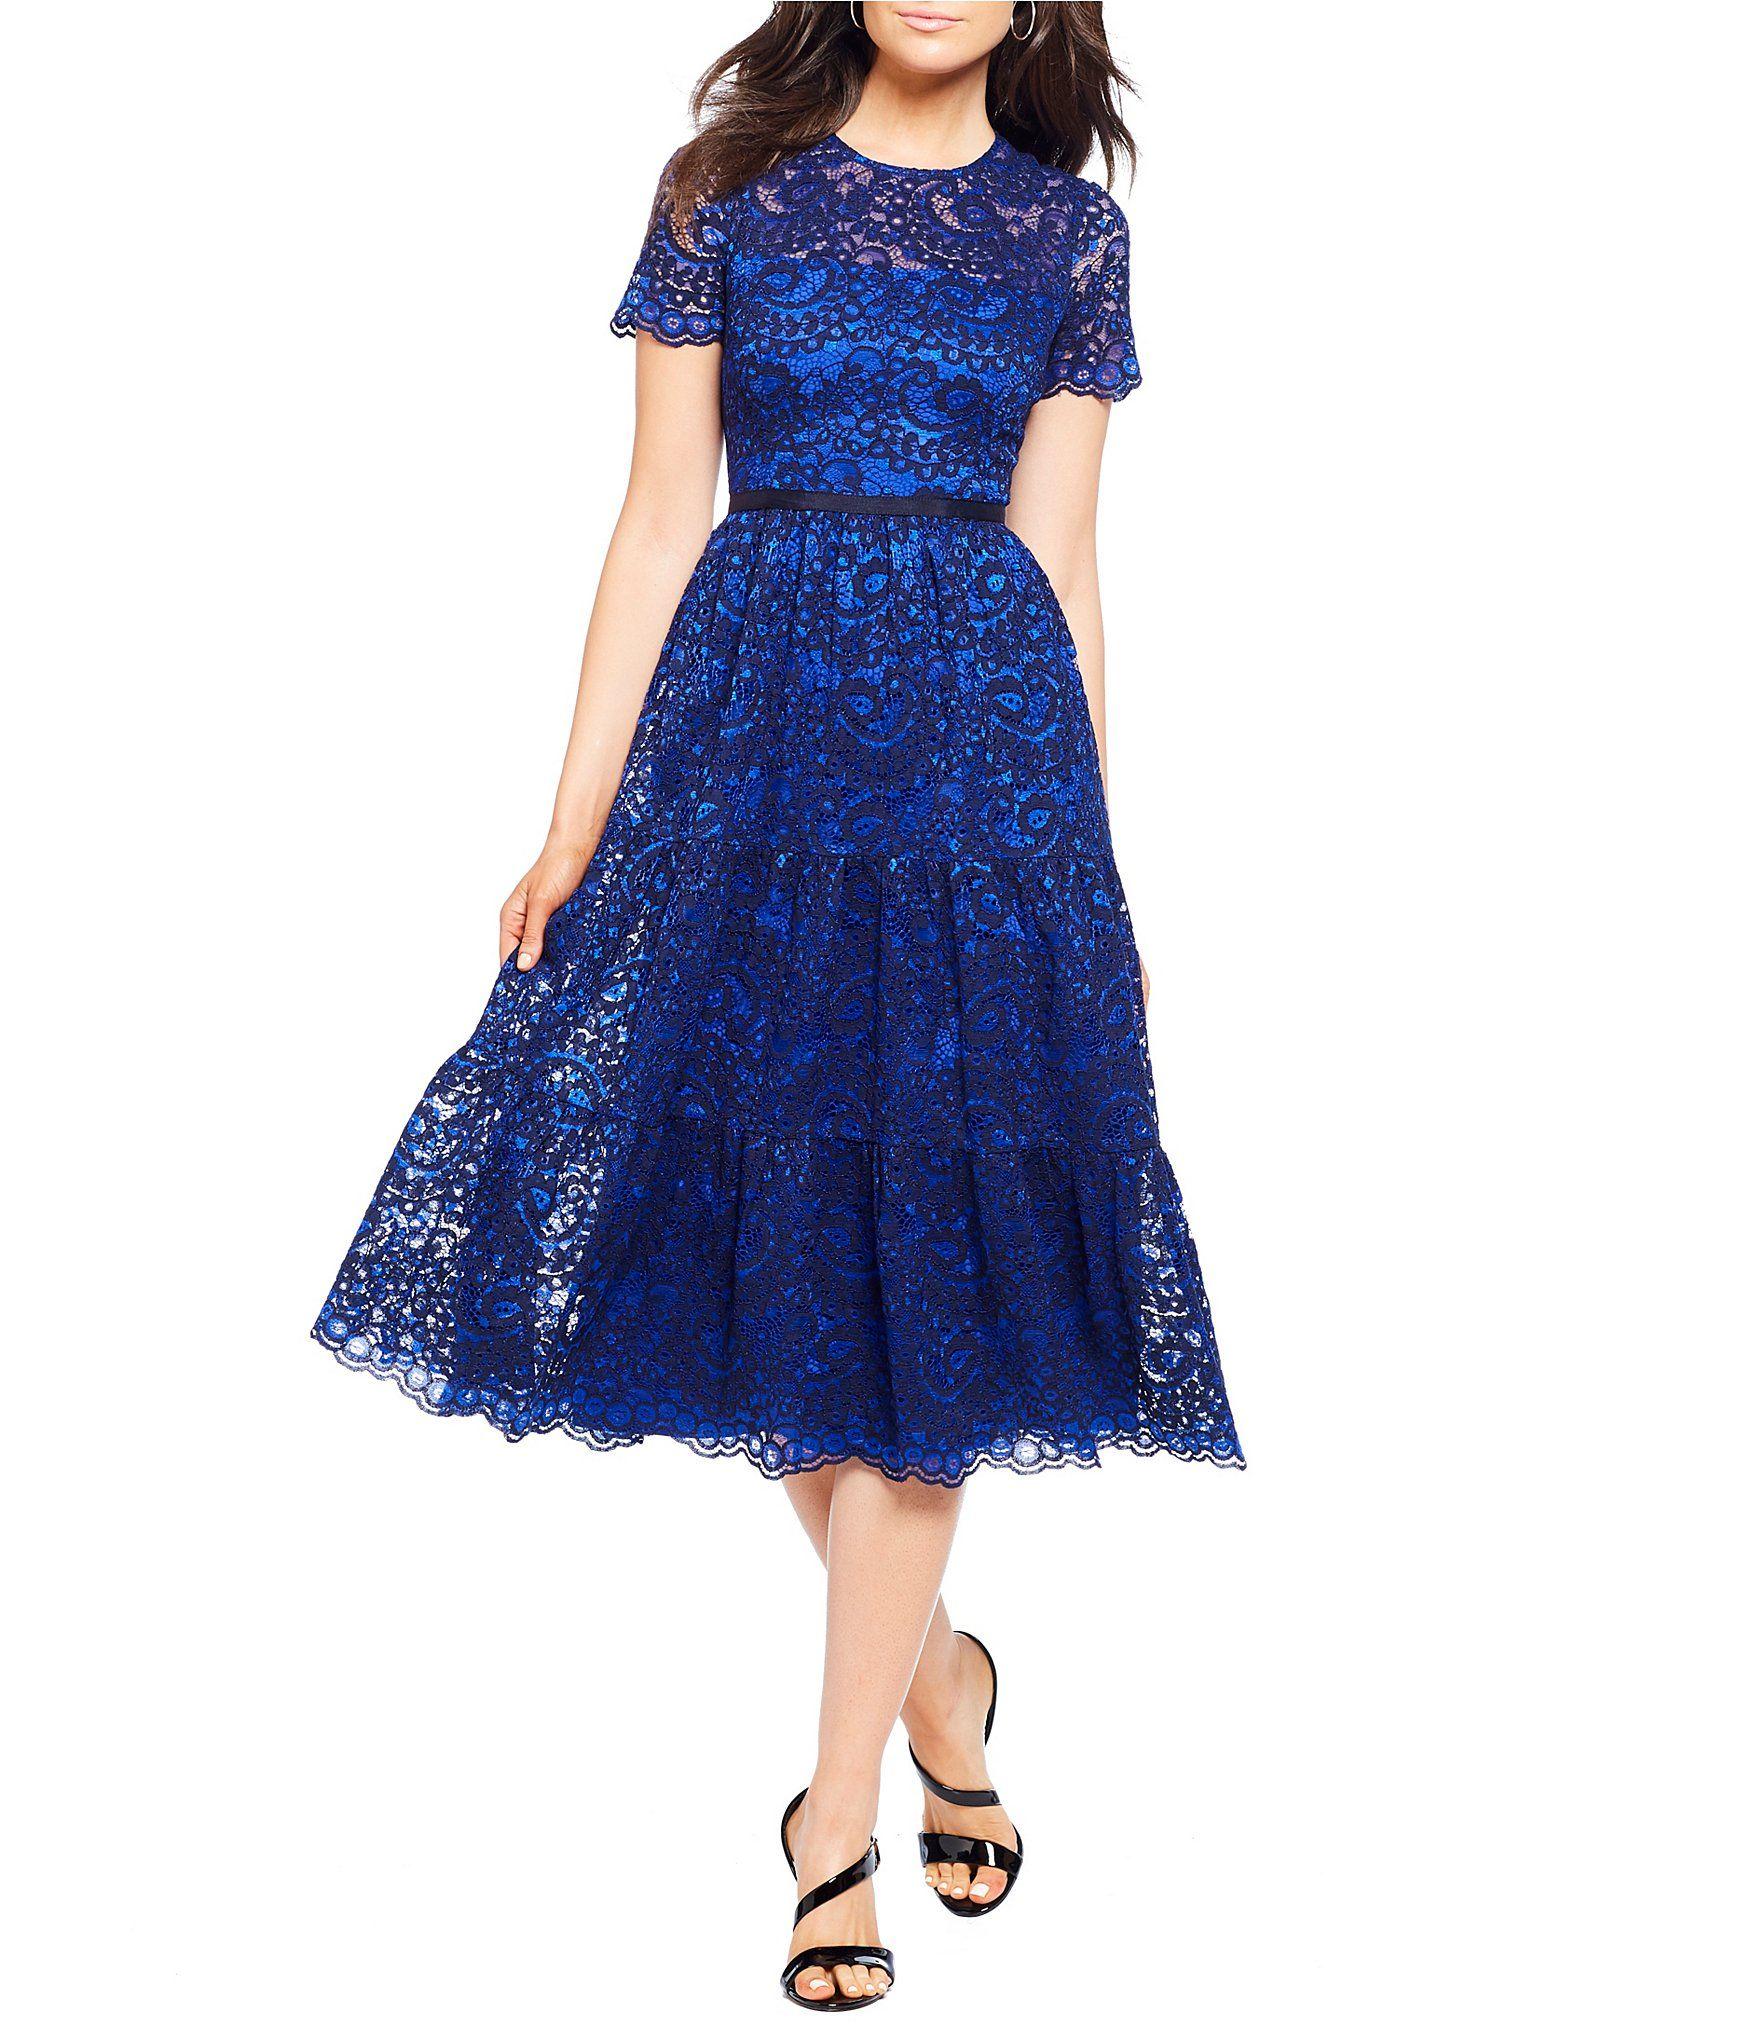 a9da7429e2 Maggy London Tiered Lace Midi Dress  Dillards